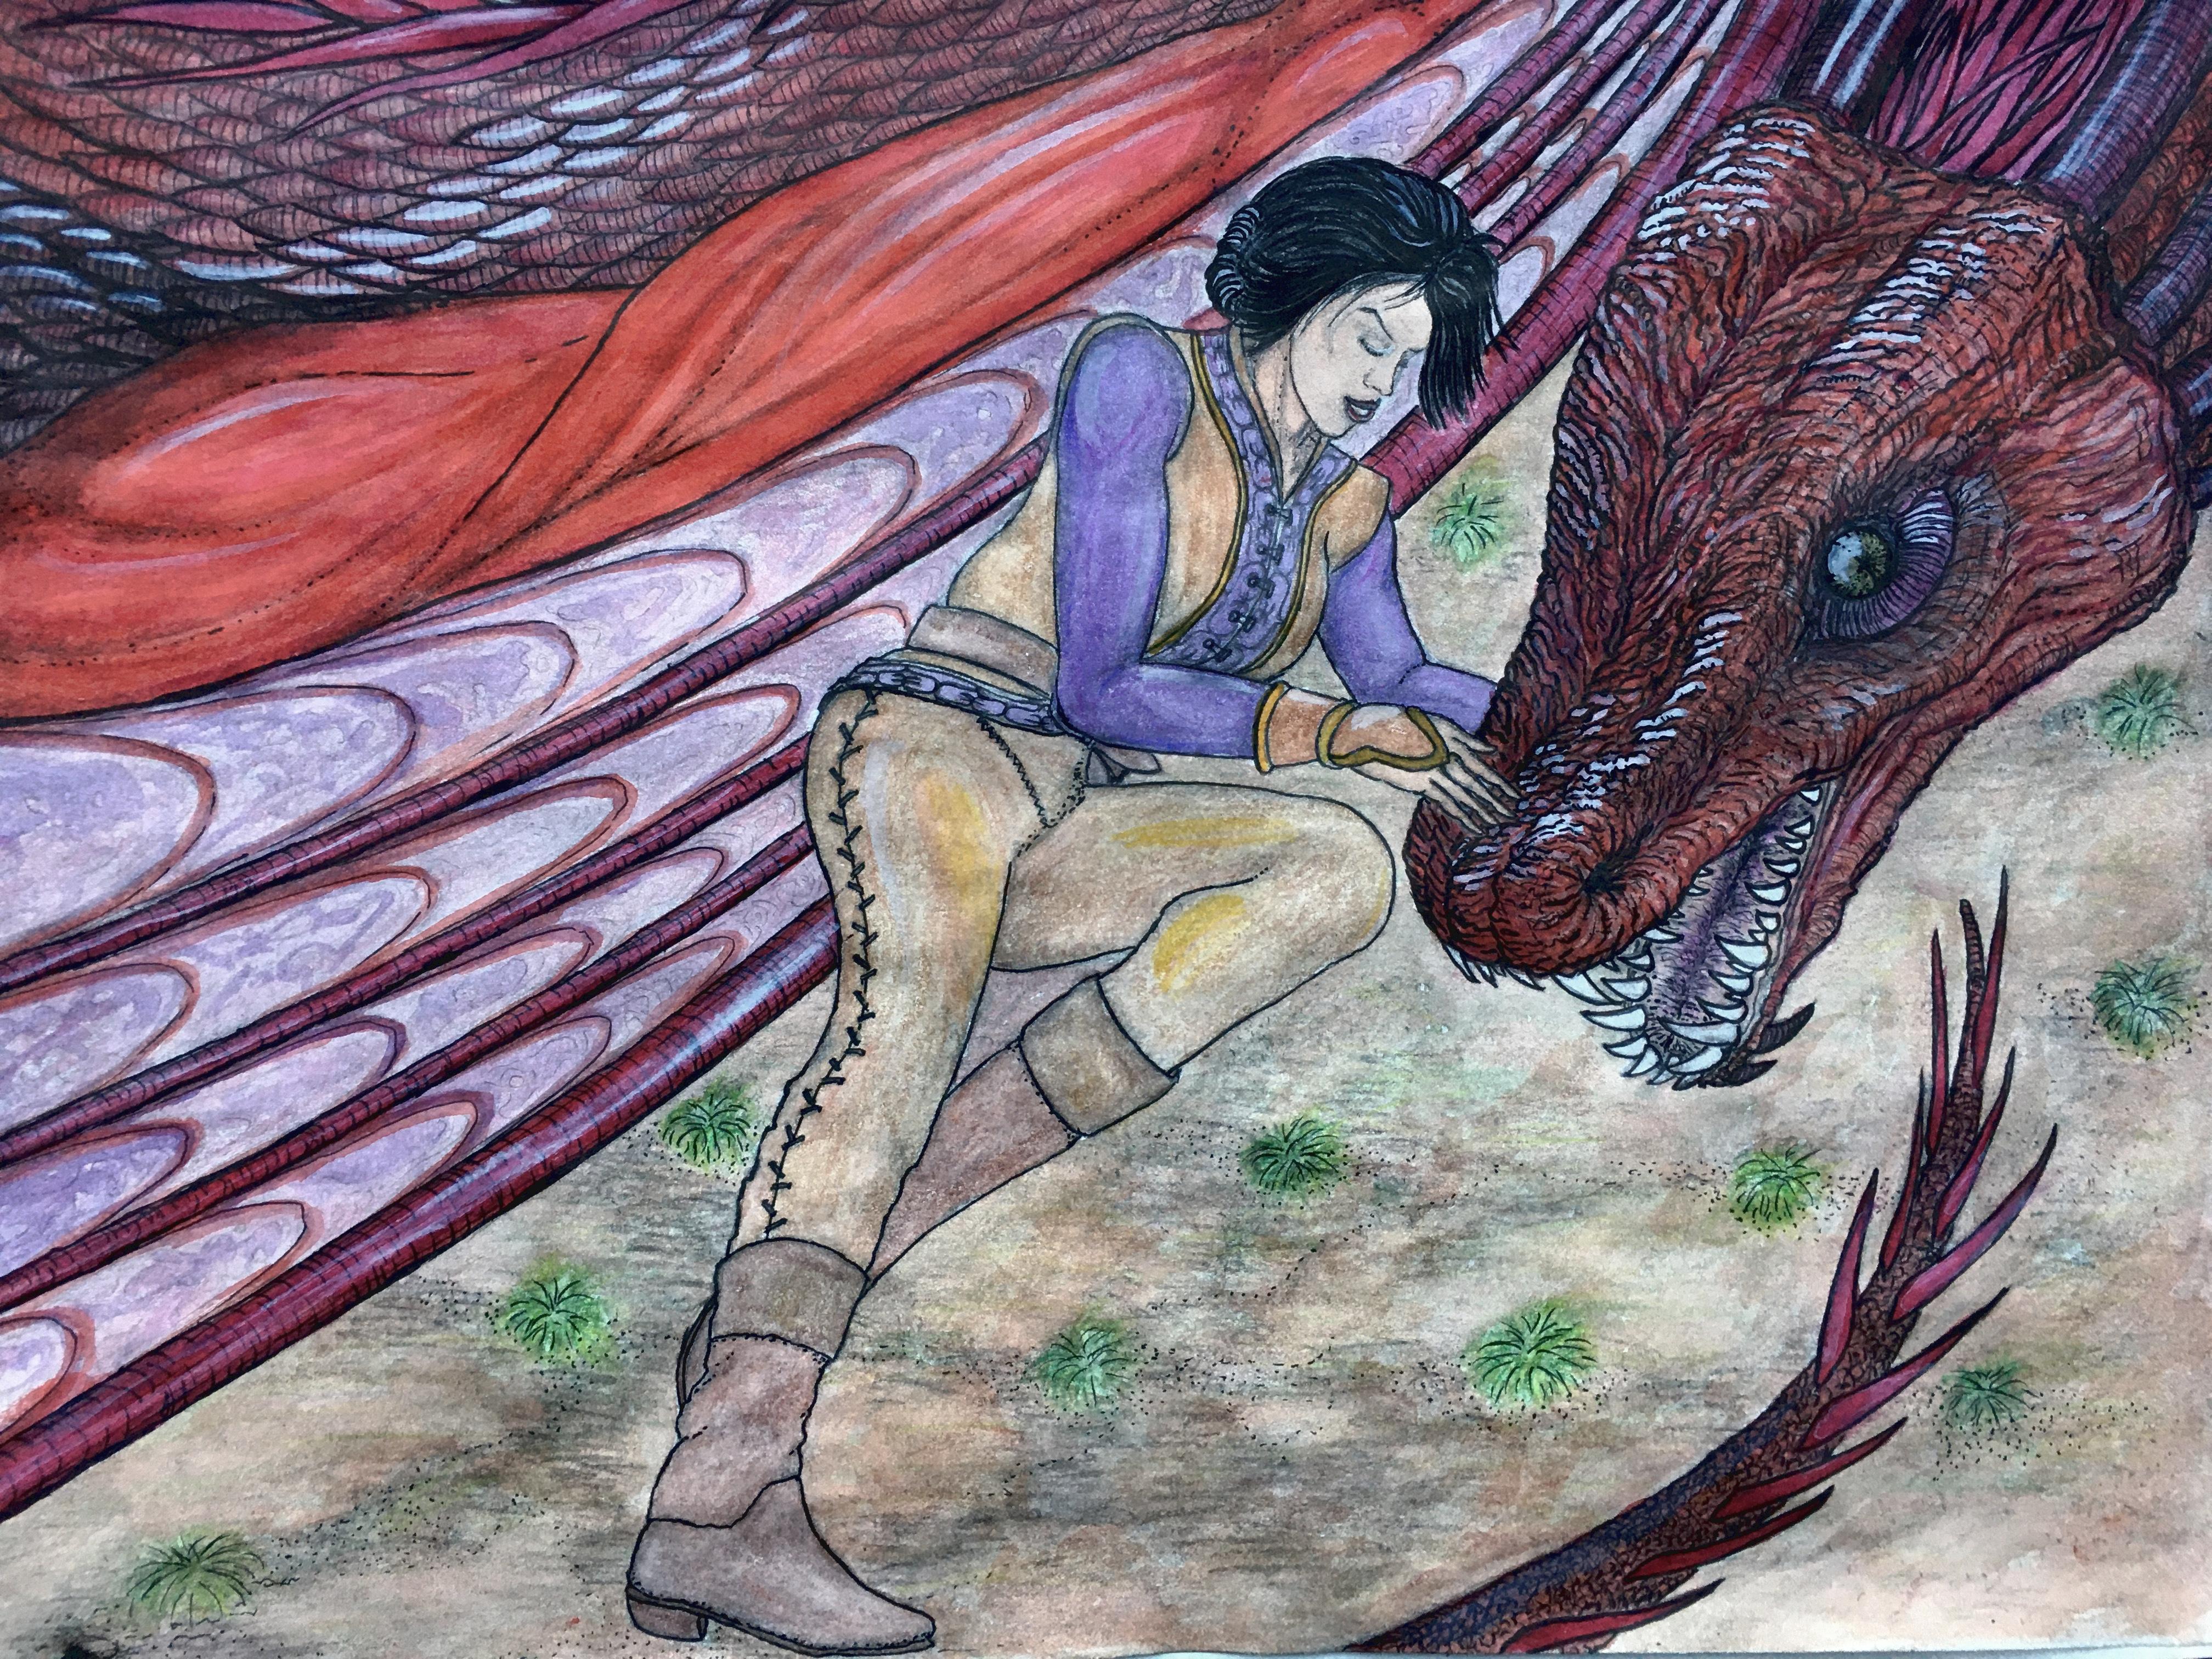 Princess Rhaenys Targaryen and the dragon Meleys